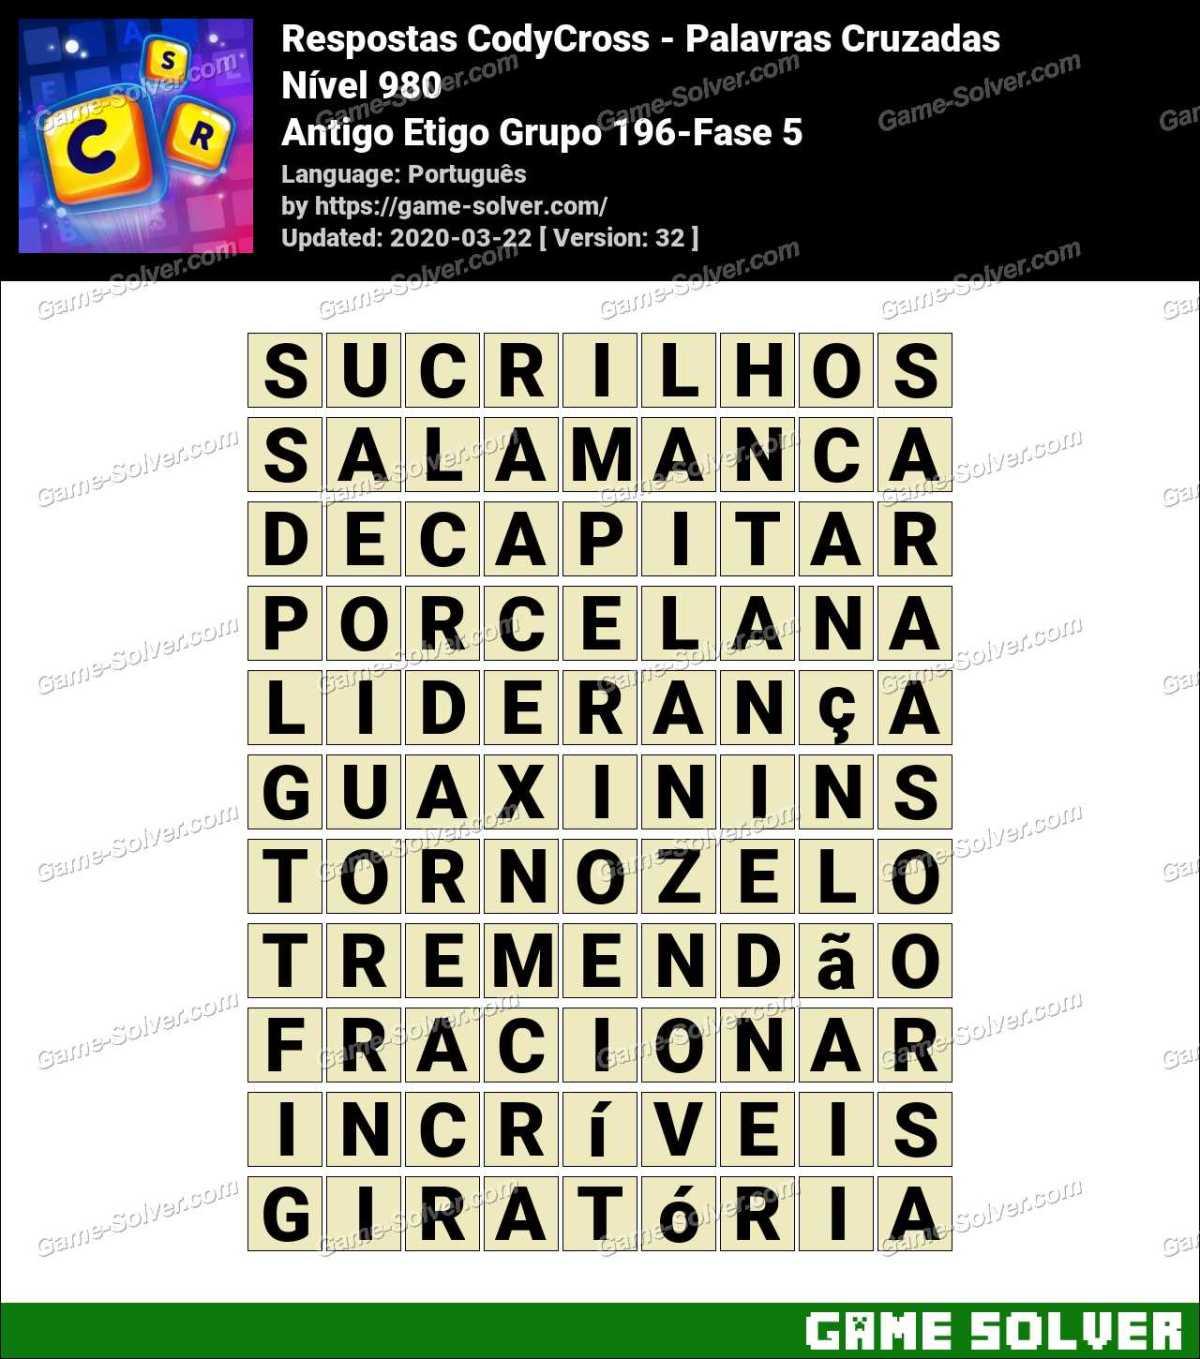 Respostas CodyCross Antigo Etigo Grupo 196-Fase 5